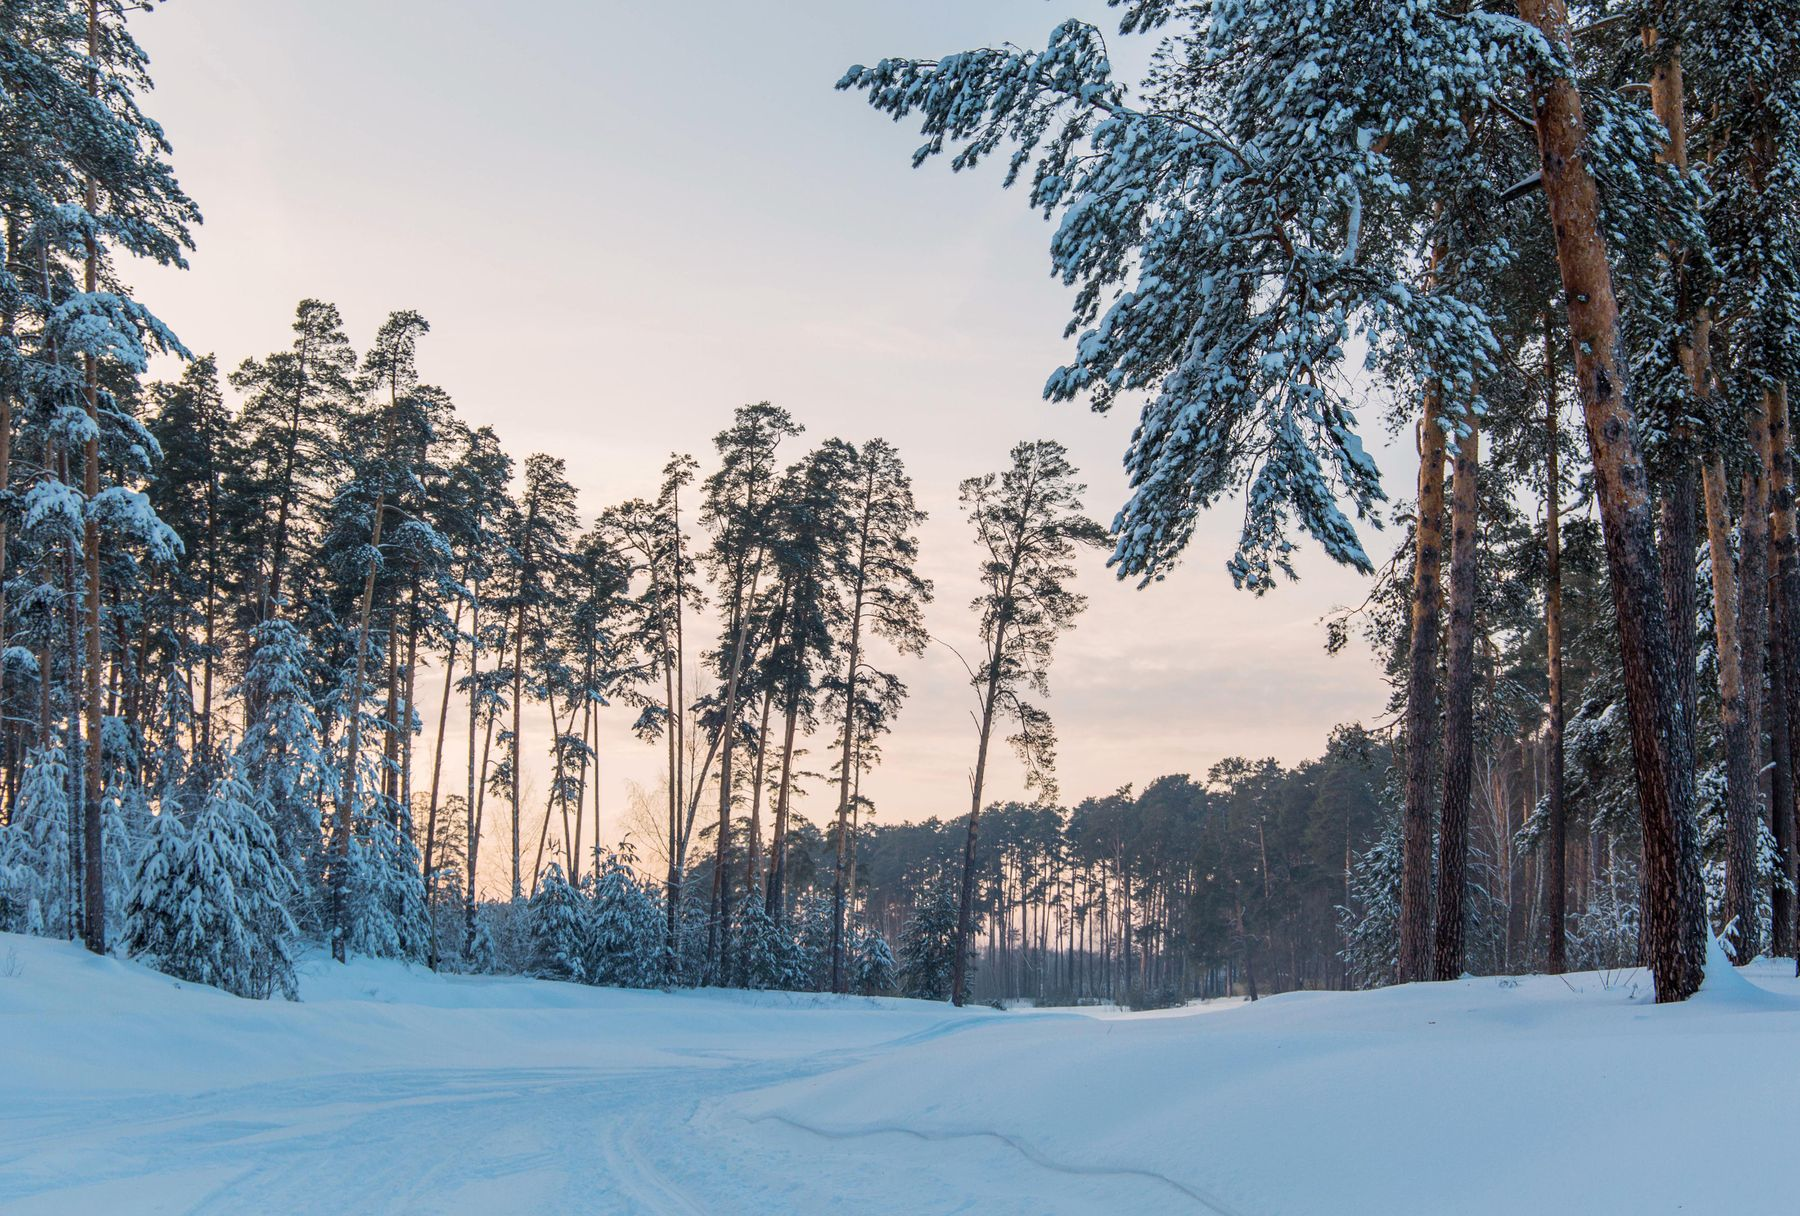 лесопарк Лебяжье природа пейзаж зима вечер татарстан лес лесопарк лебяжье